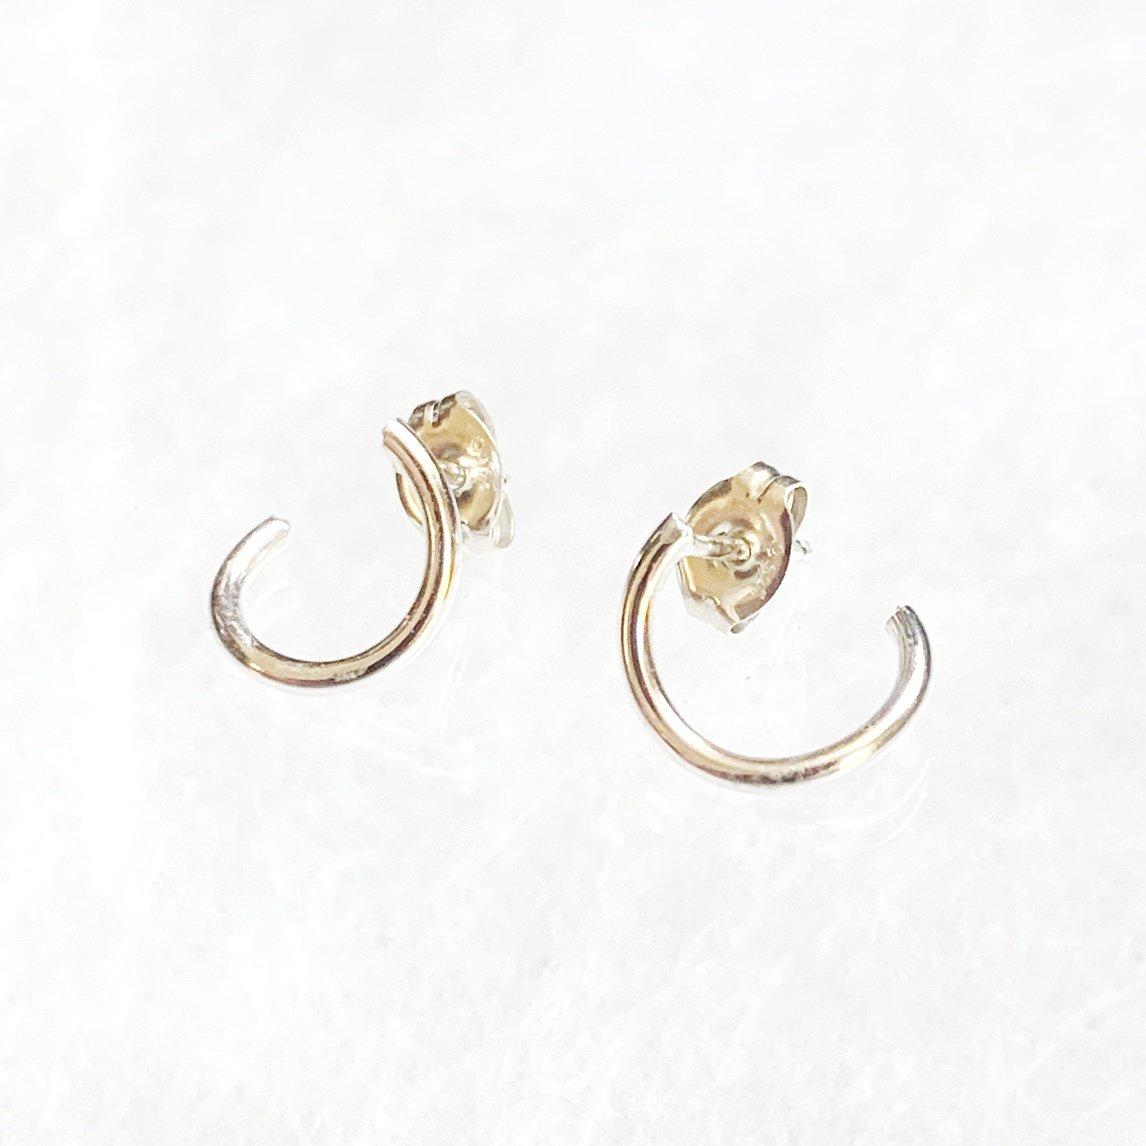 Image of Crescent Ear Huggers